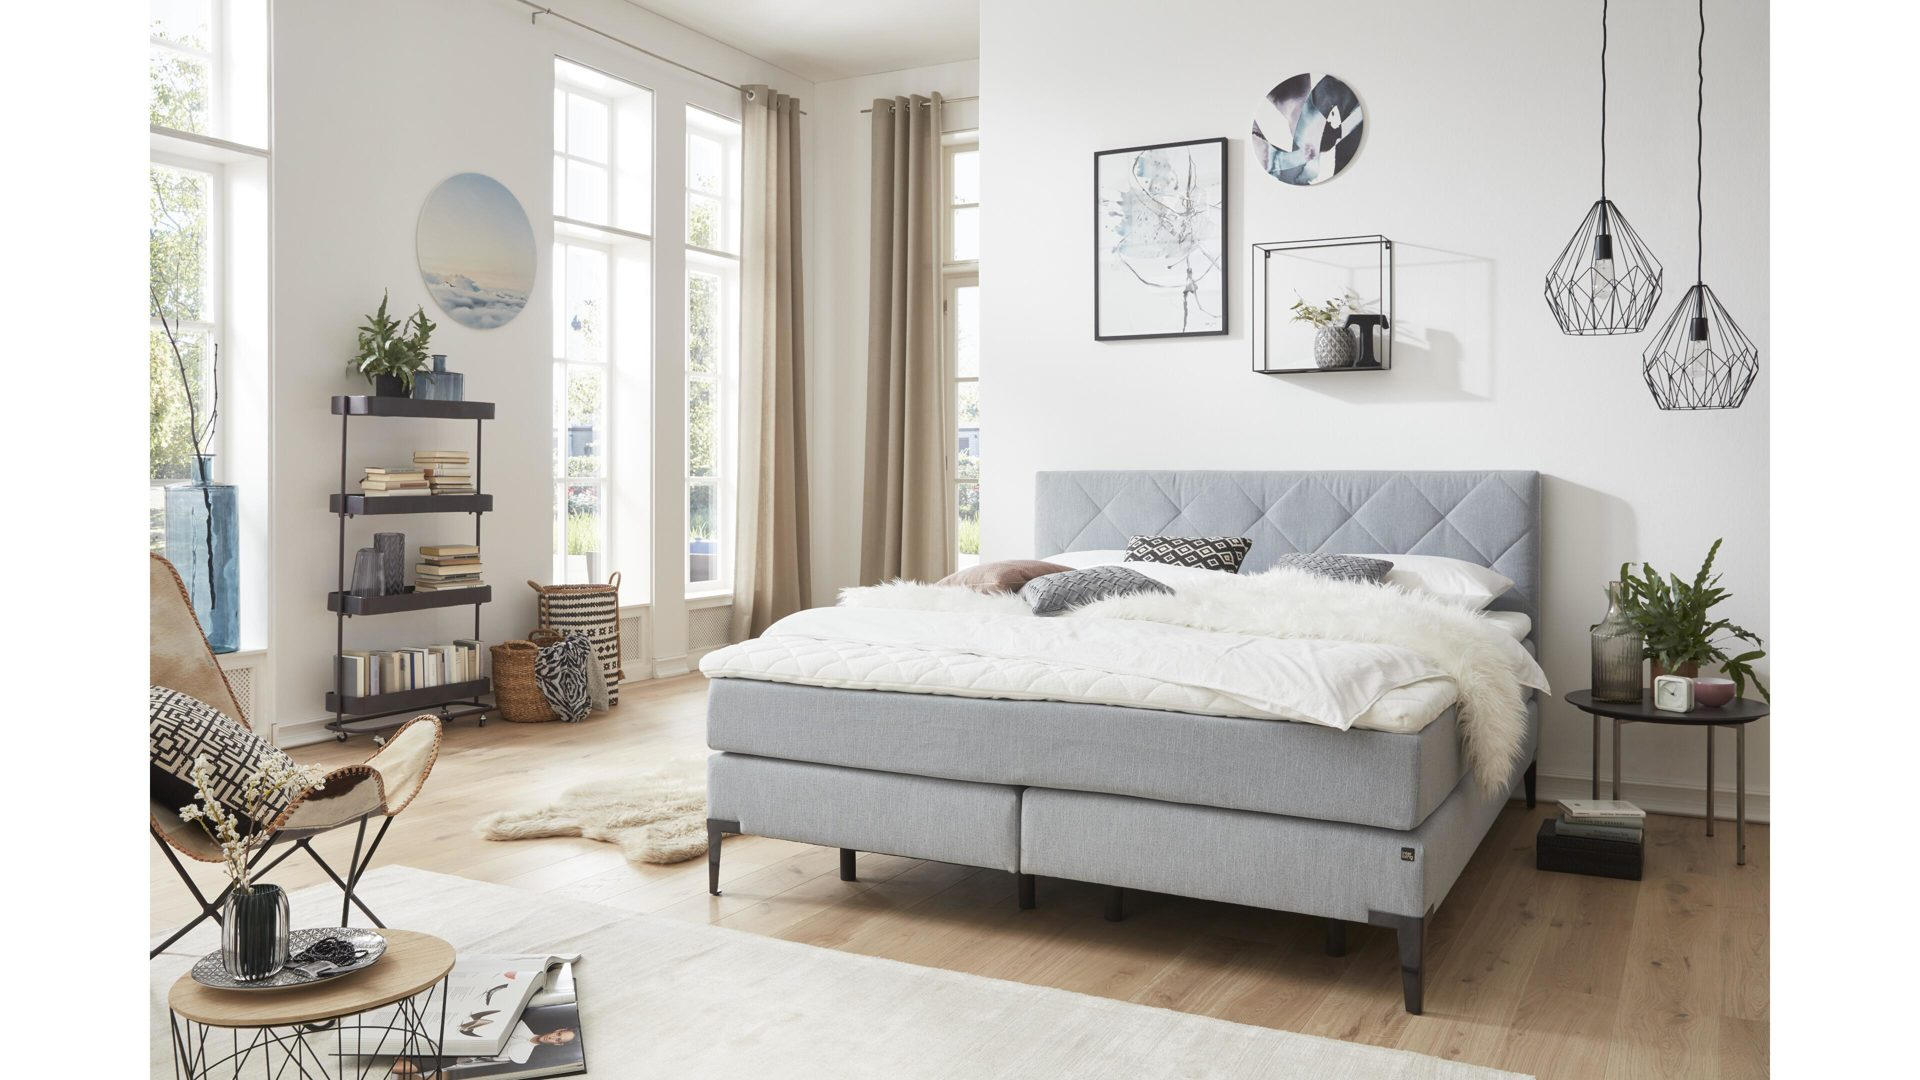 Mobel Bock Raume Schlafzimmer Betten Interliving Interliving